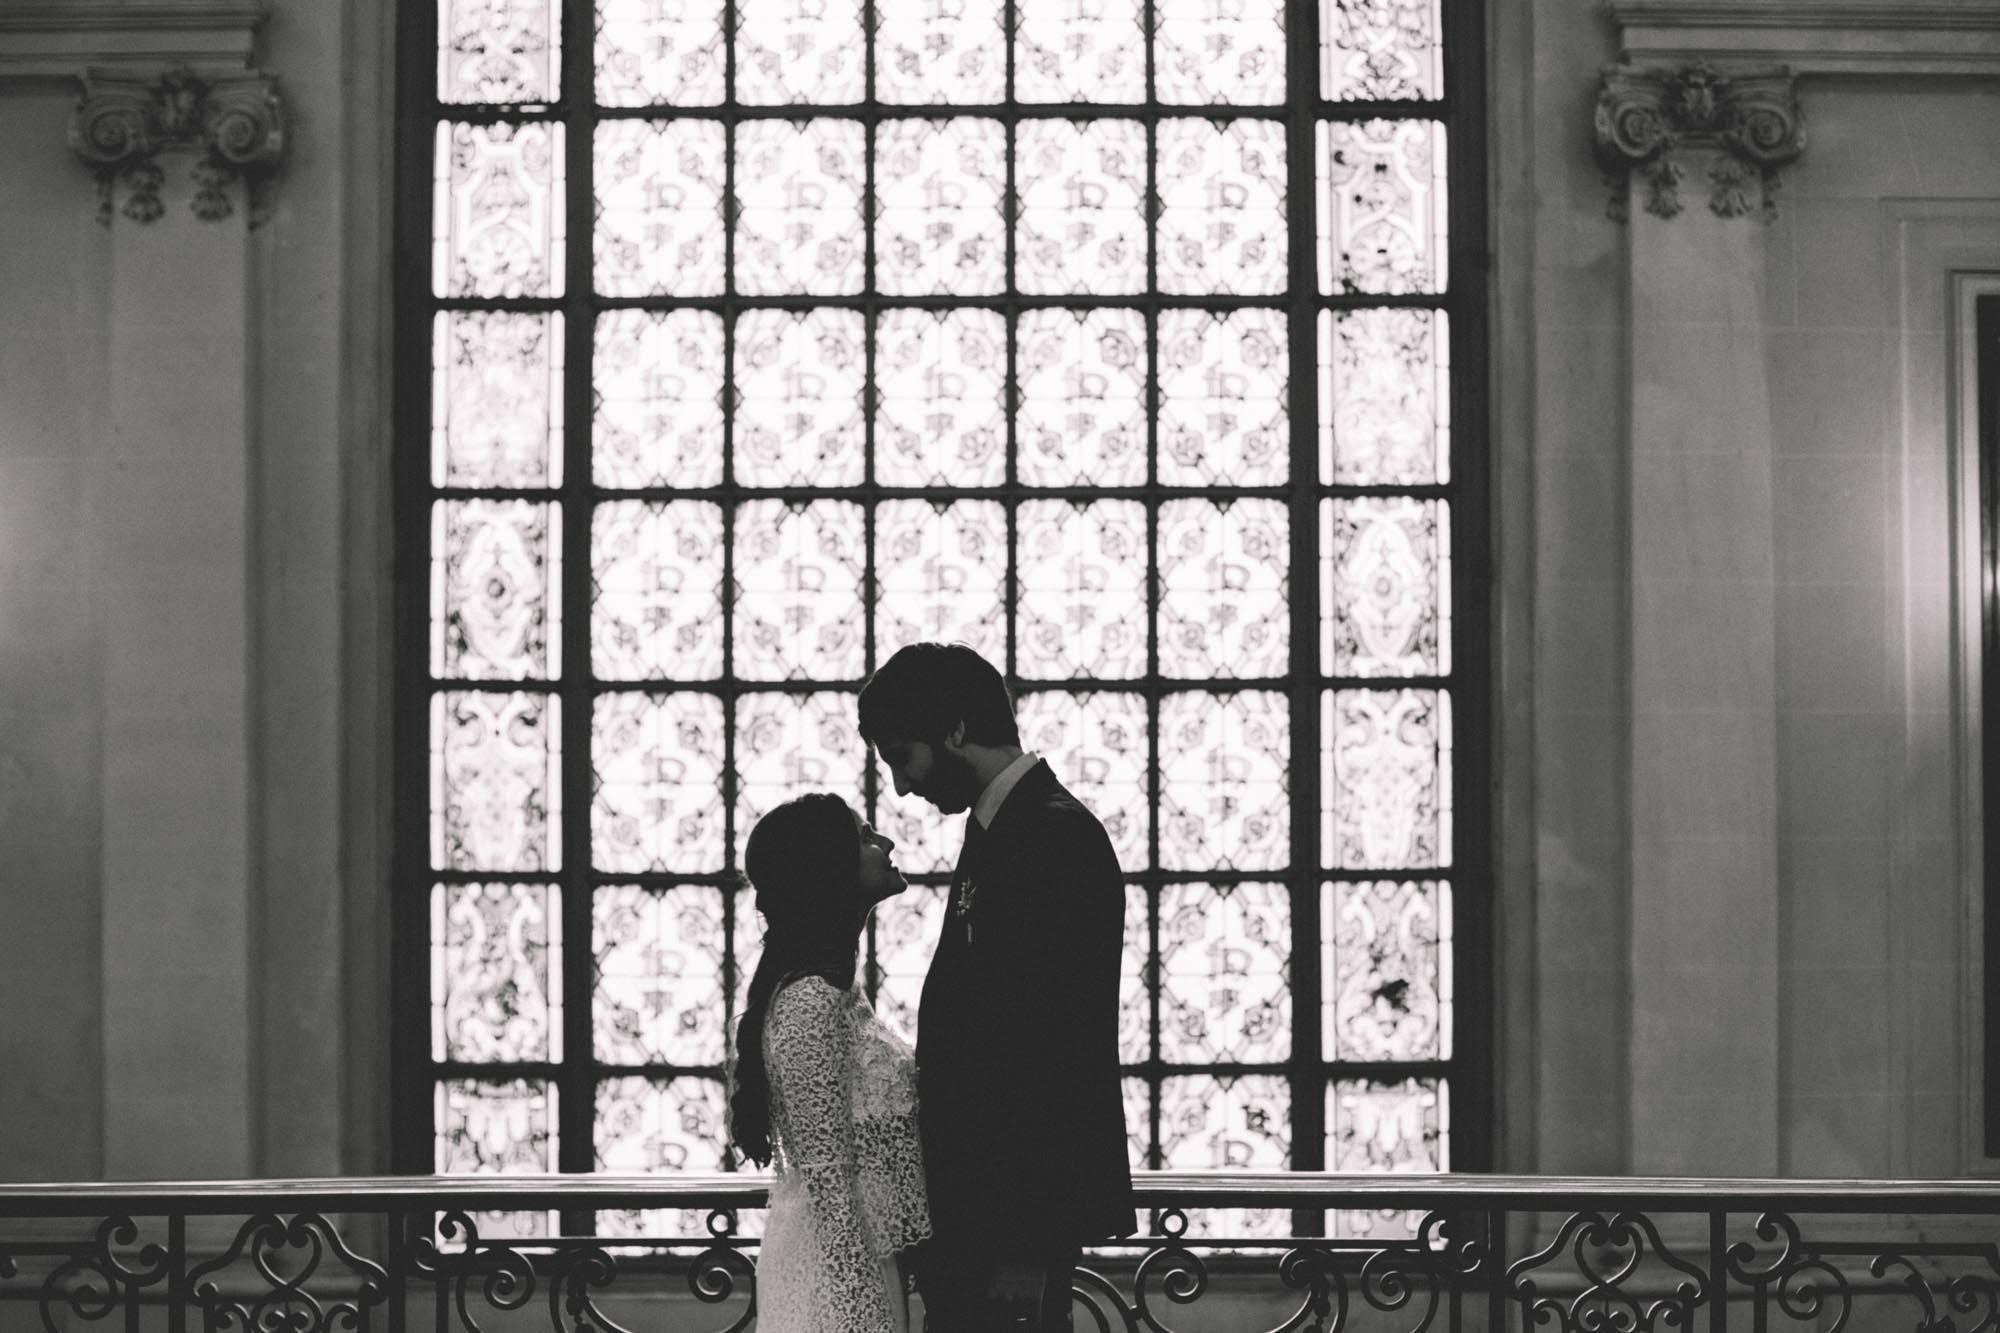 AXELLE + CHARLES_PARIS_PHOTOGRAPHE MARIAGE_LES BANDITS-1